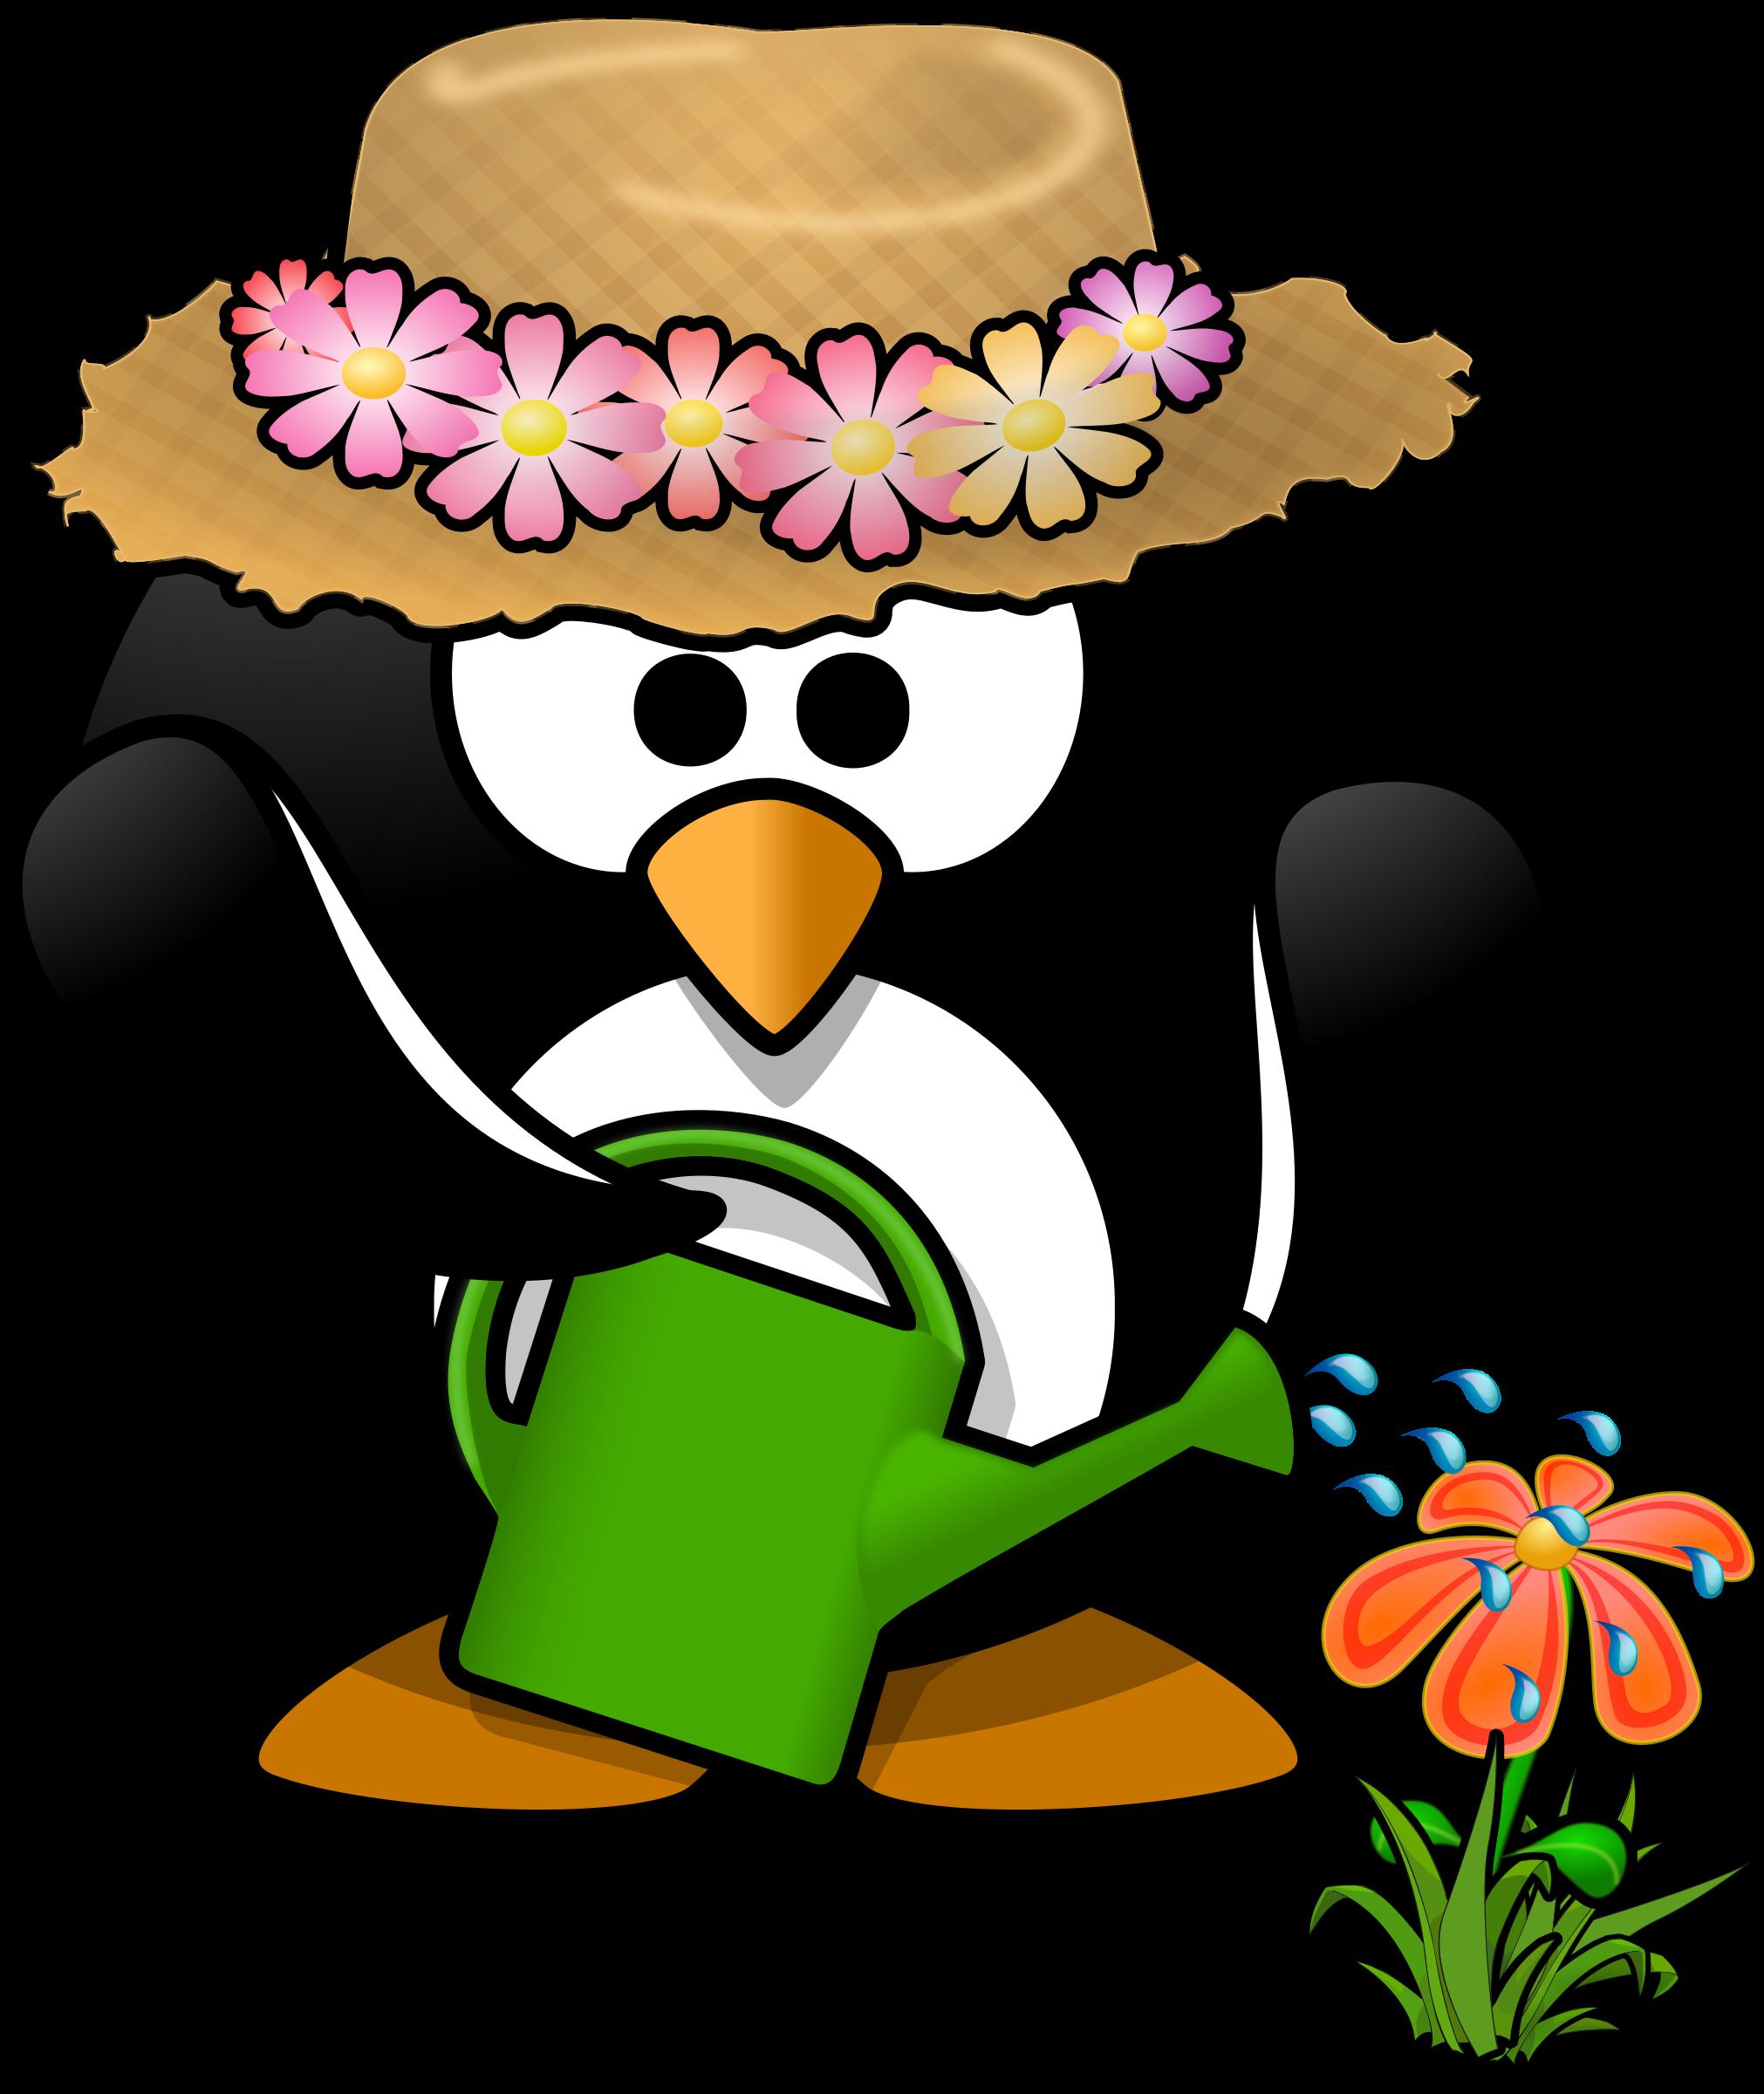 2022x2400 Microsoft Clip Art Gardening Clipart Garden Penguin Toublanc Info